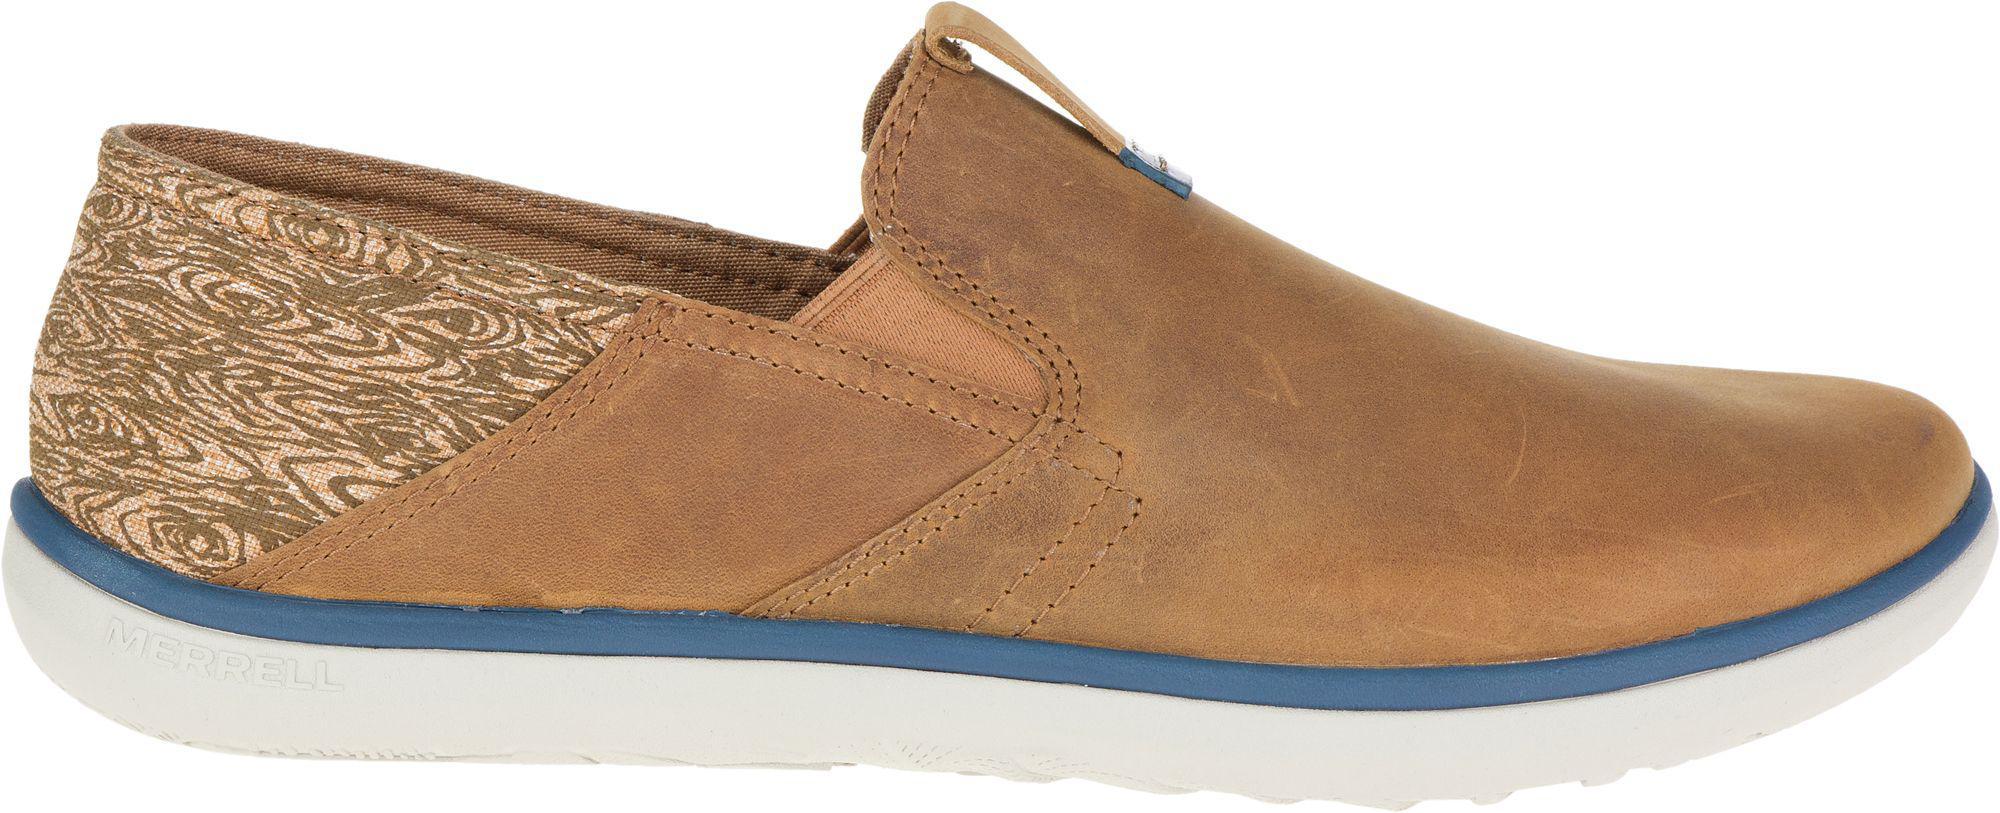 Men For Shoes Merrell Moc Brown Lyst Duskair Casual In IWEDb9e2YH